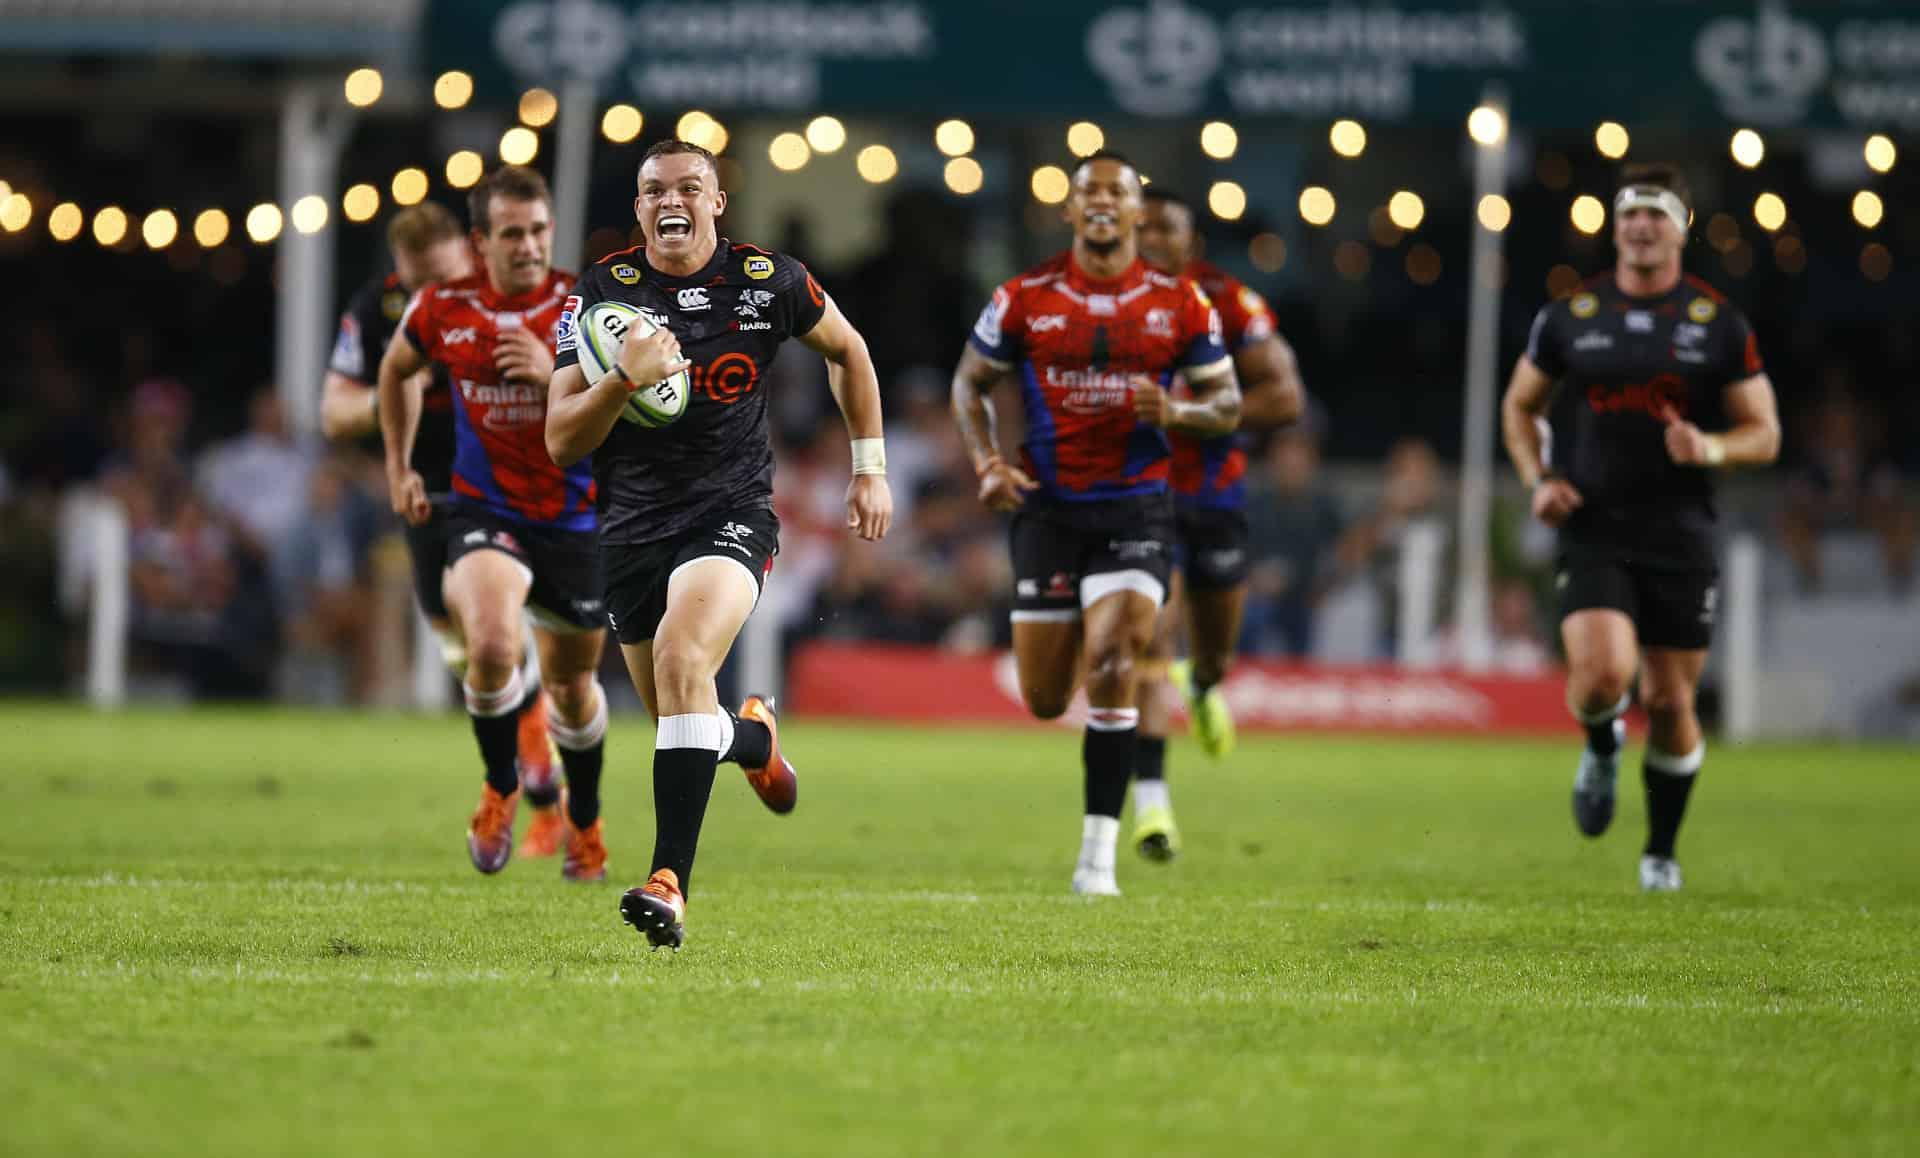 Sharks Curwin Bosch Super Rugby Unlocked